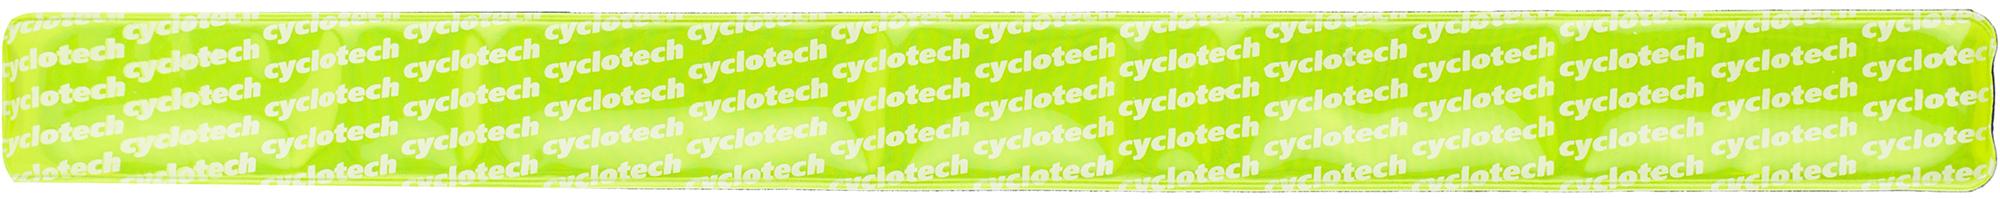 Cyclotech Браслет светоотражающий Cyclotech cyclotech выжимка цепи cyclotech